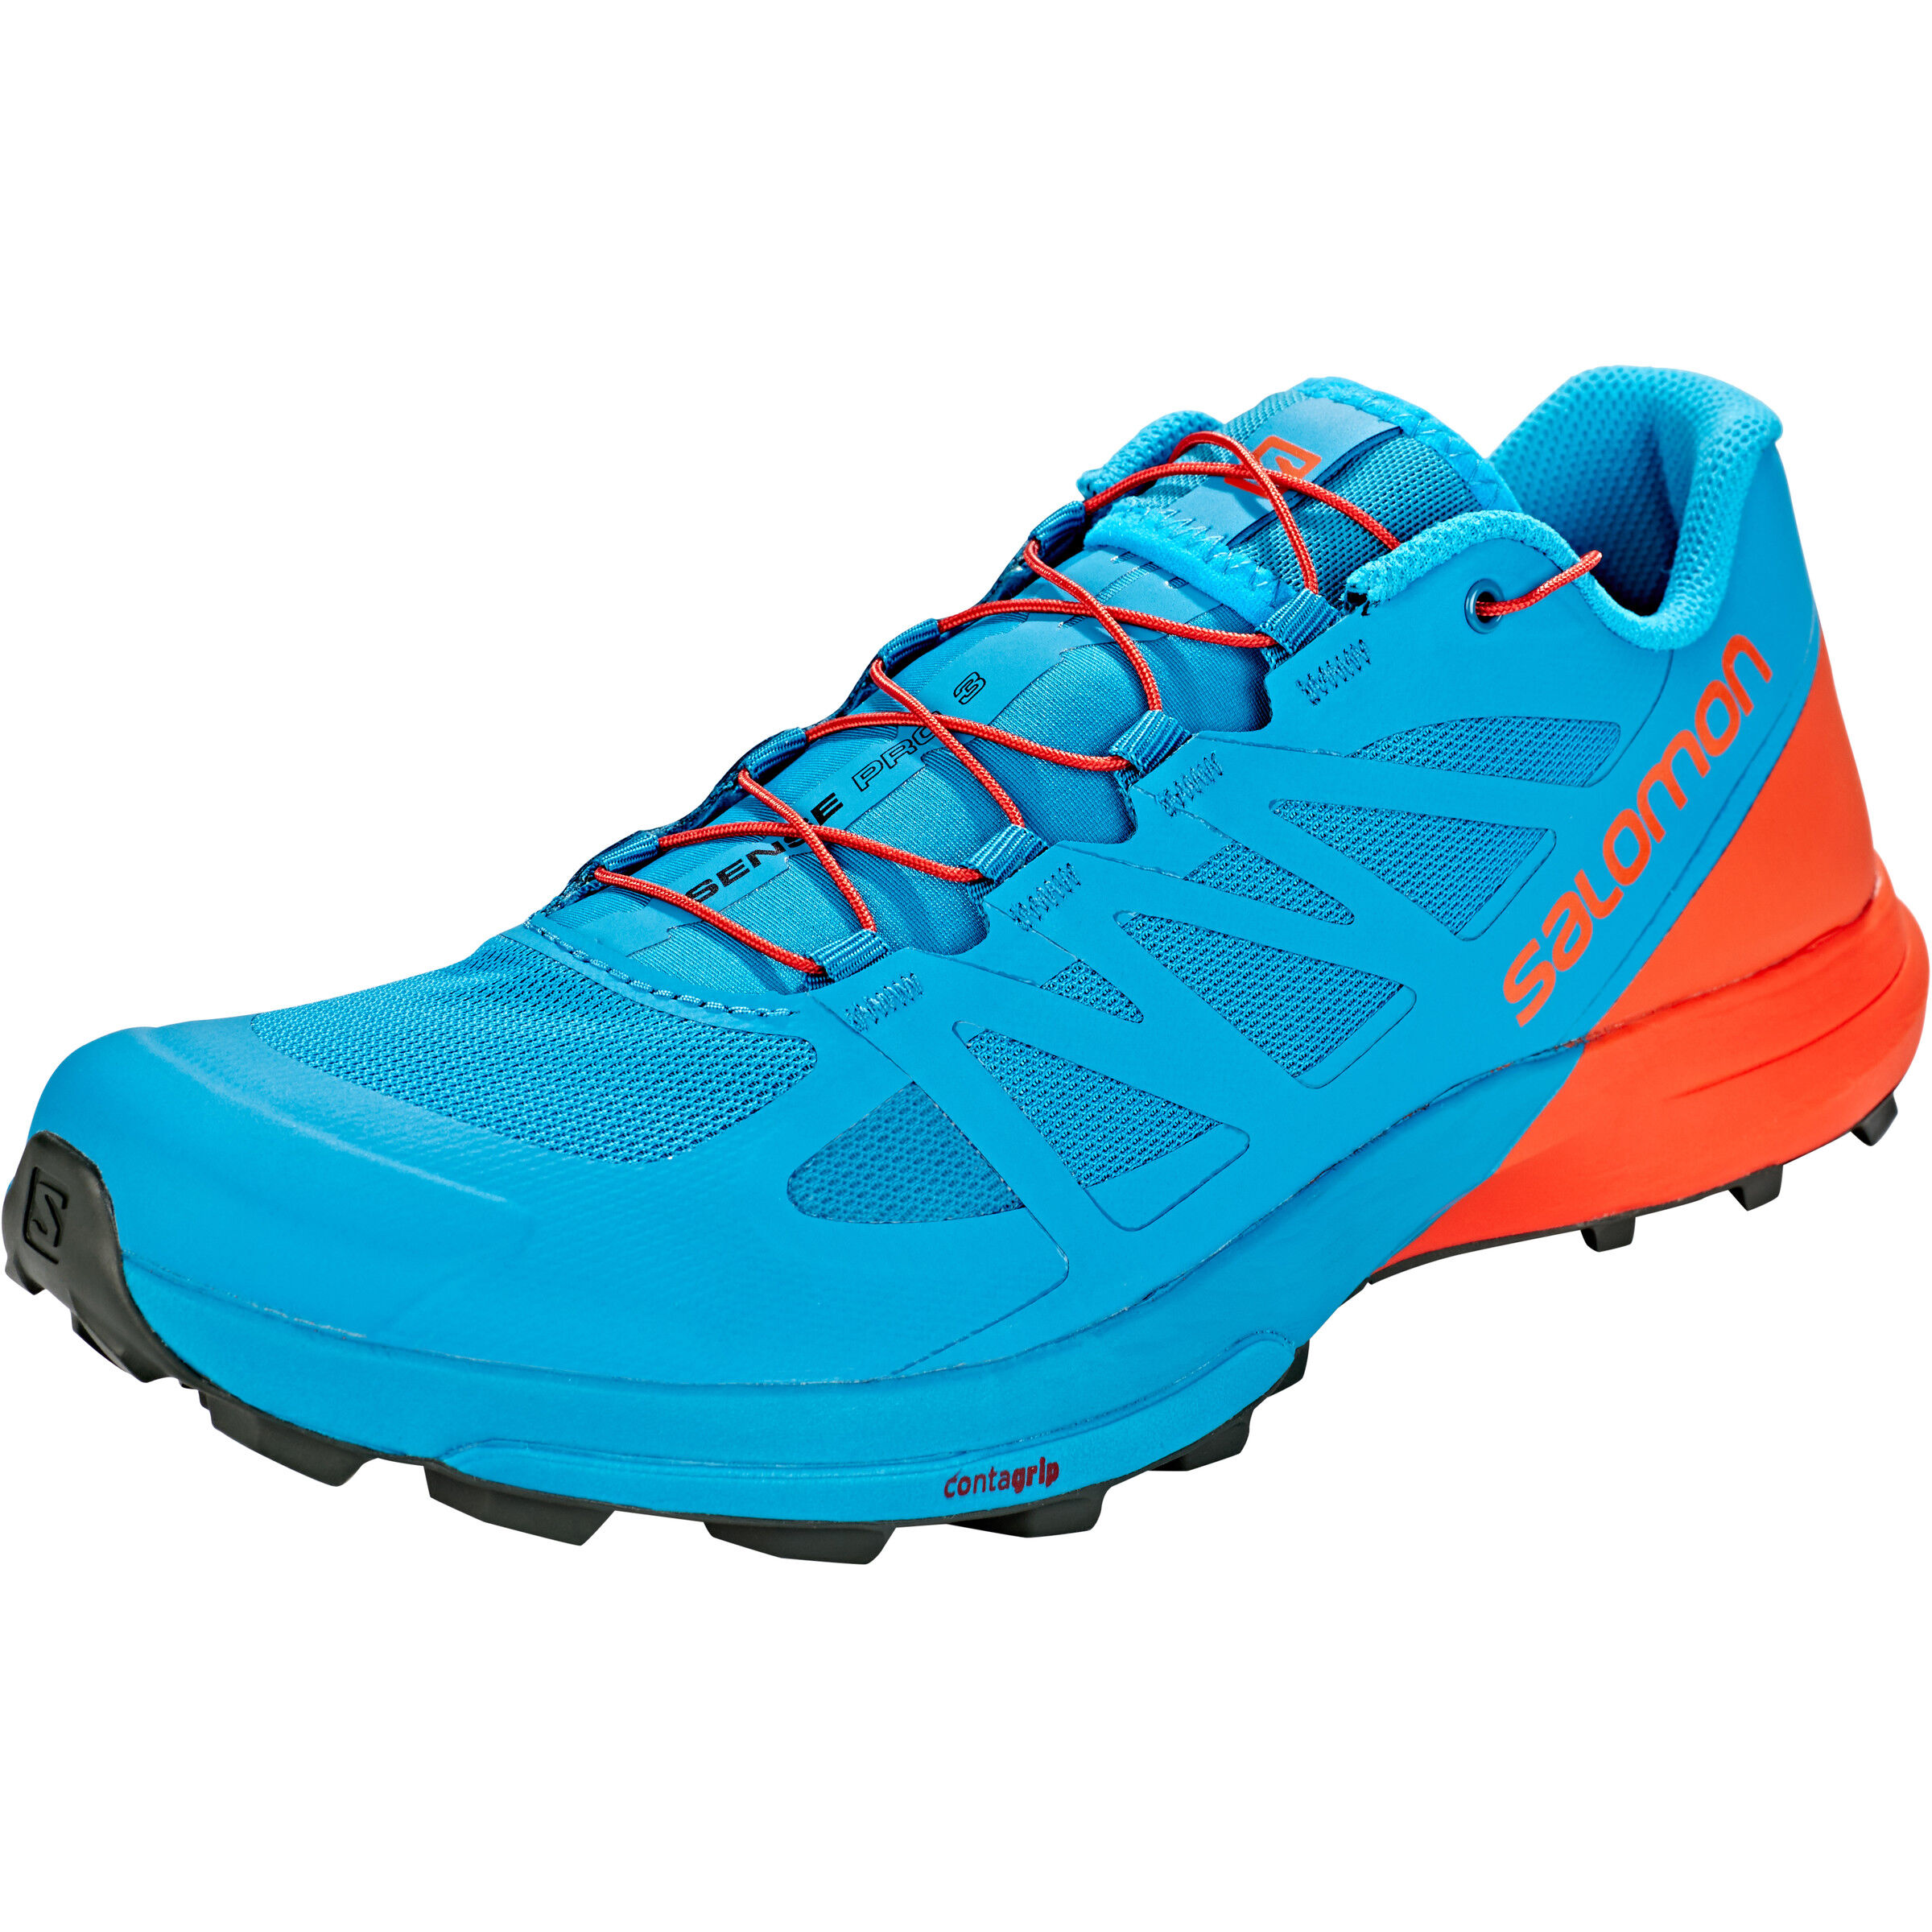 Salomon Sense Pro 3 Shoes Herren online kaufen | VssIf